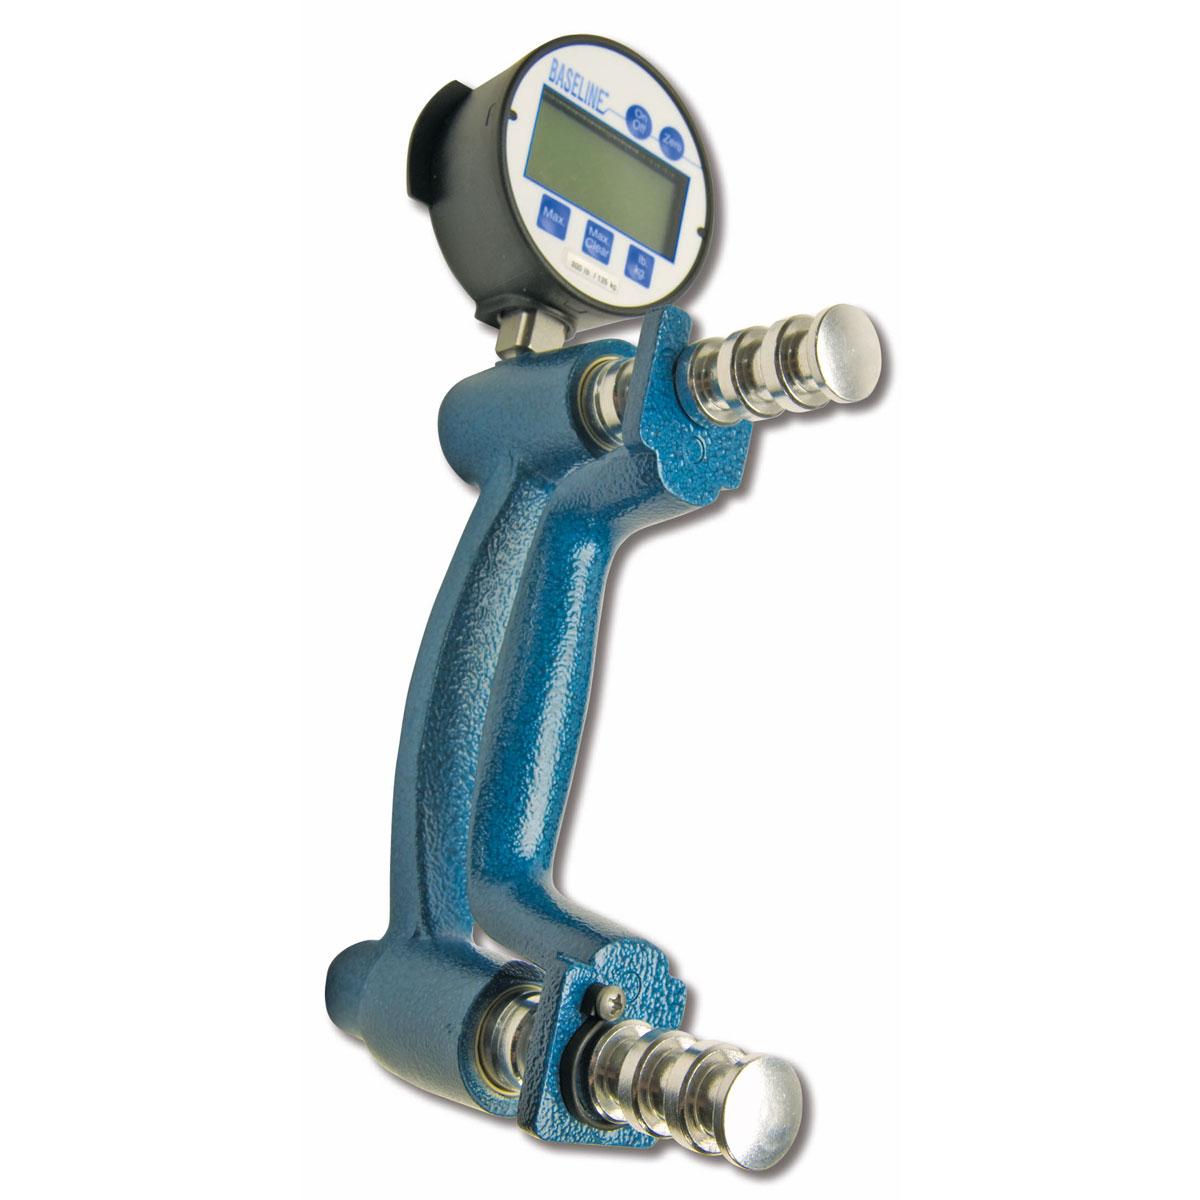 Digital Hand Dynamometer : Baseline digital lcd hand dynamometer dynamometers